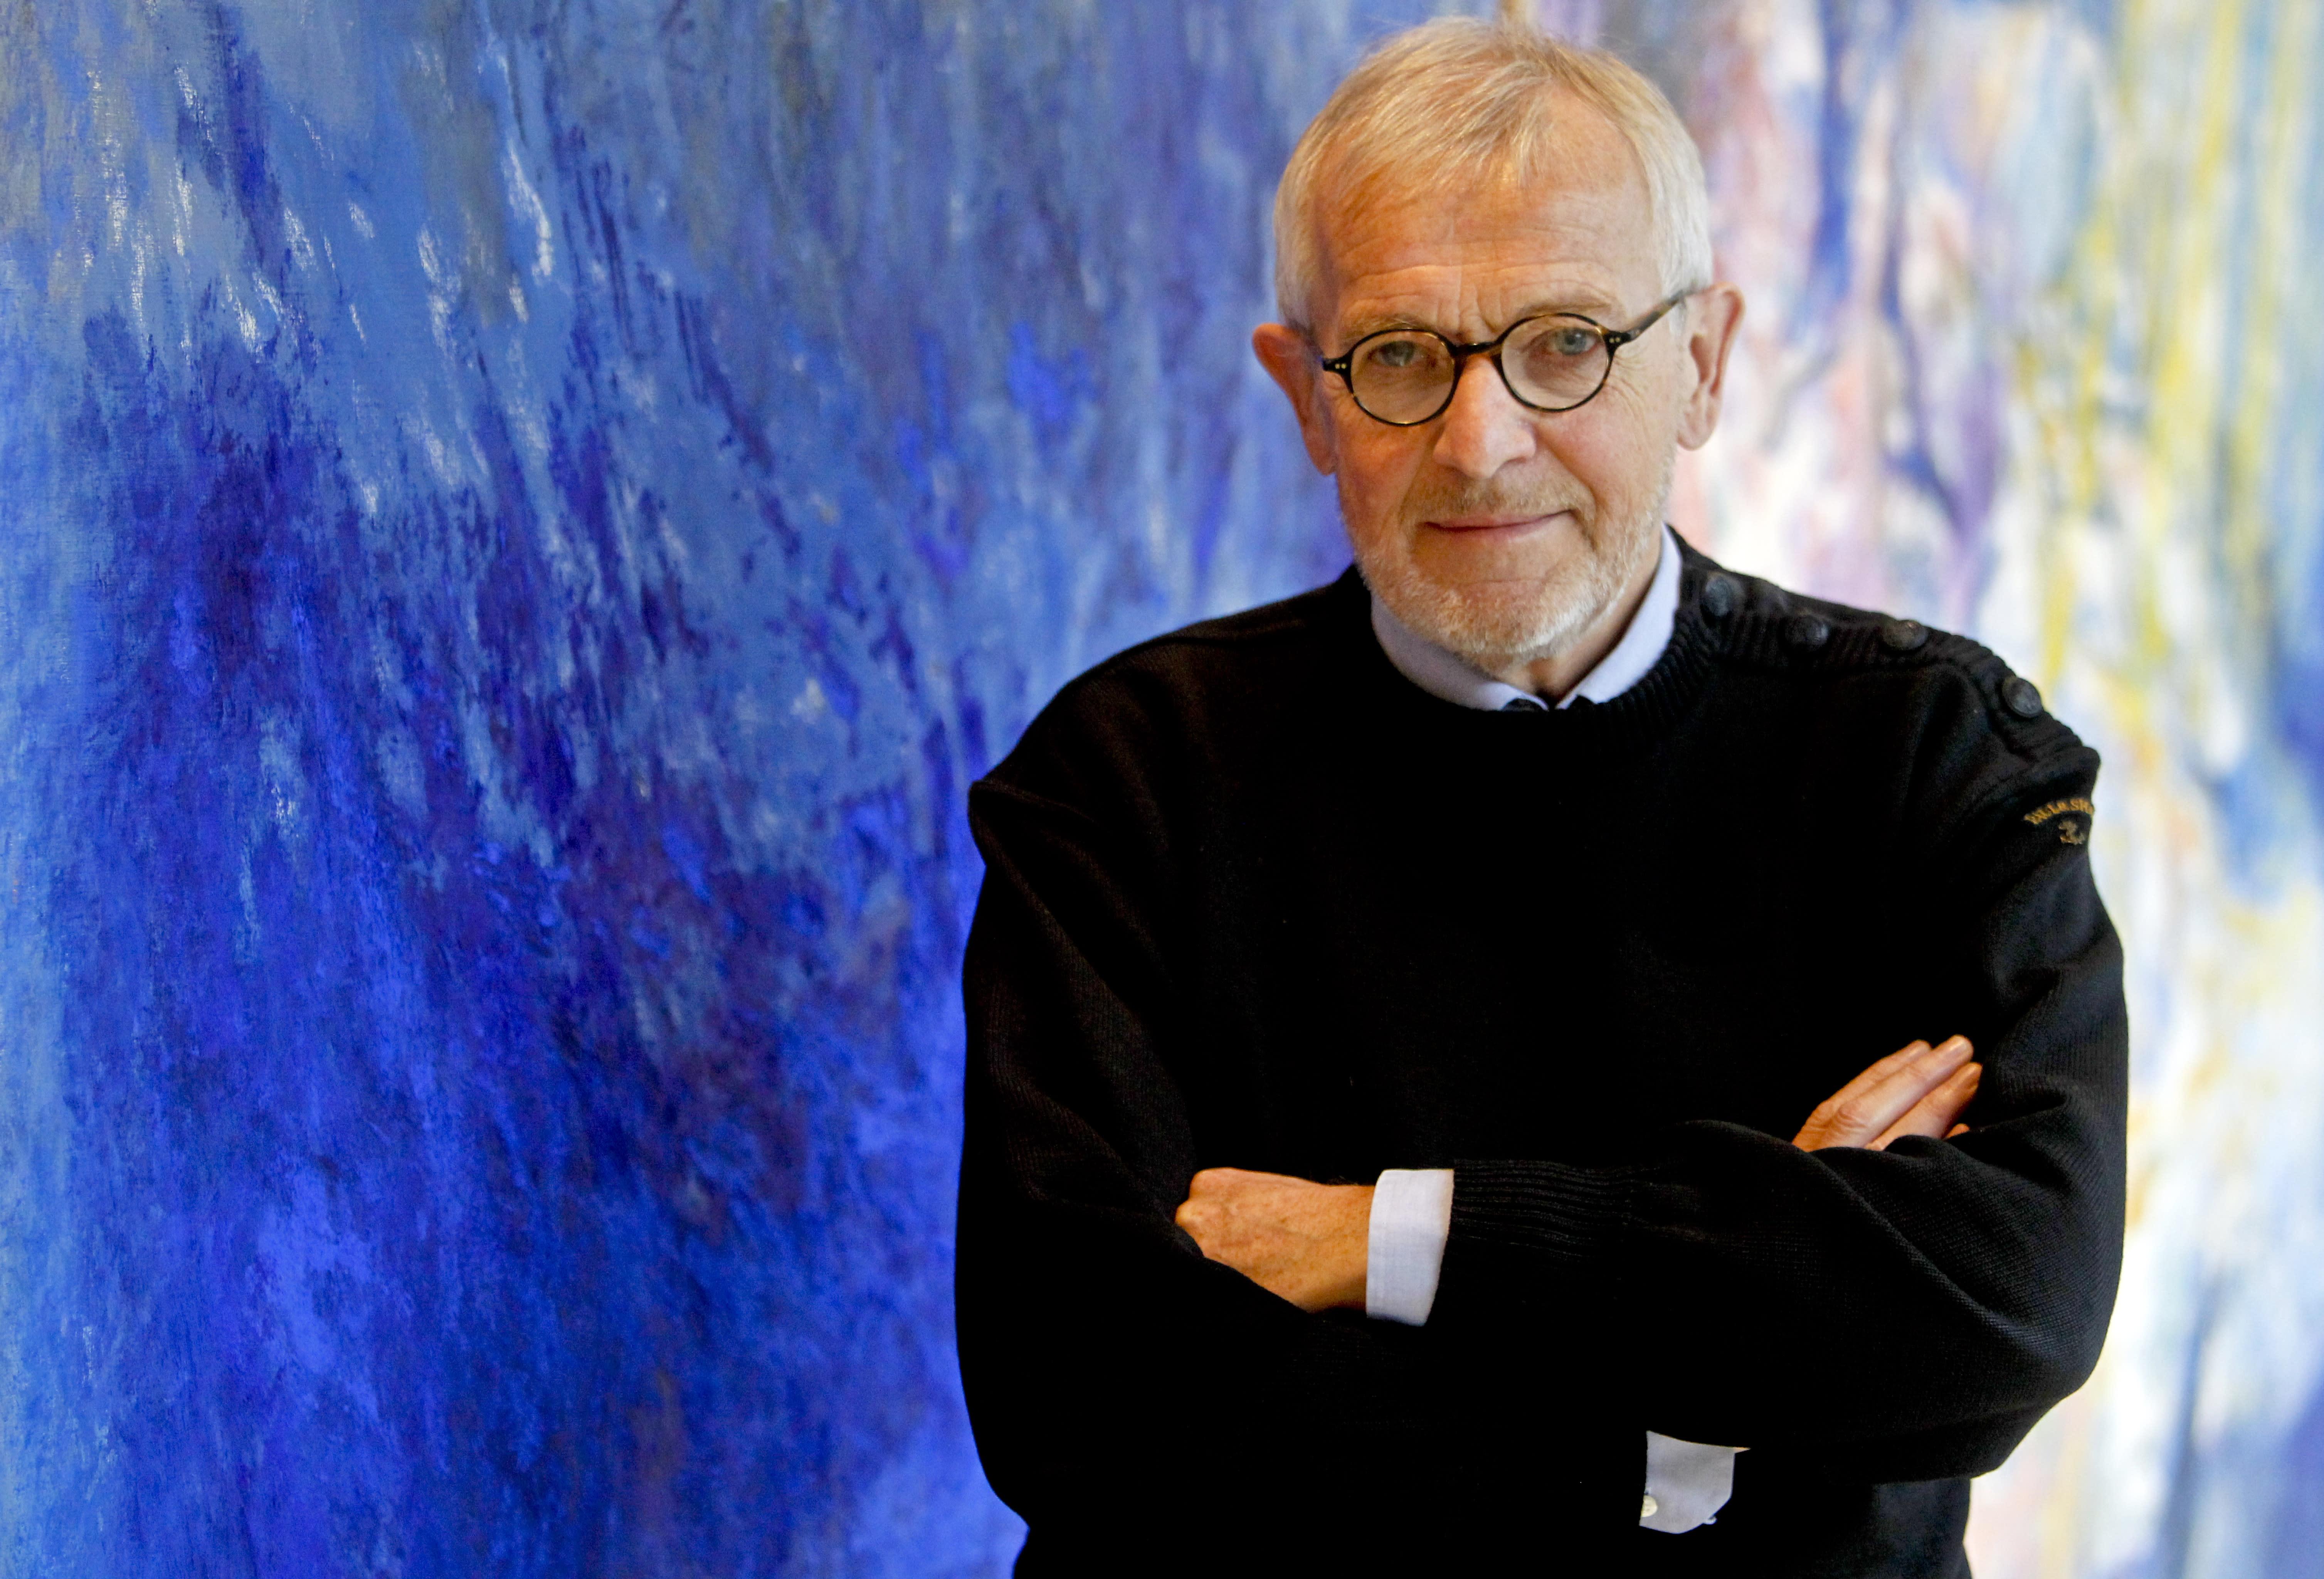 Prof. Francis Halzen